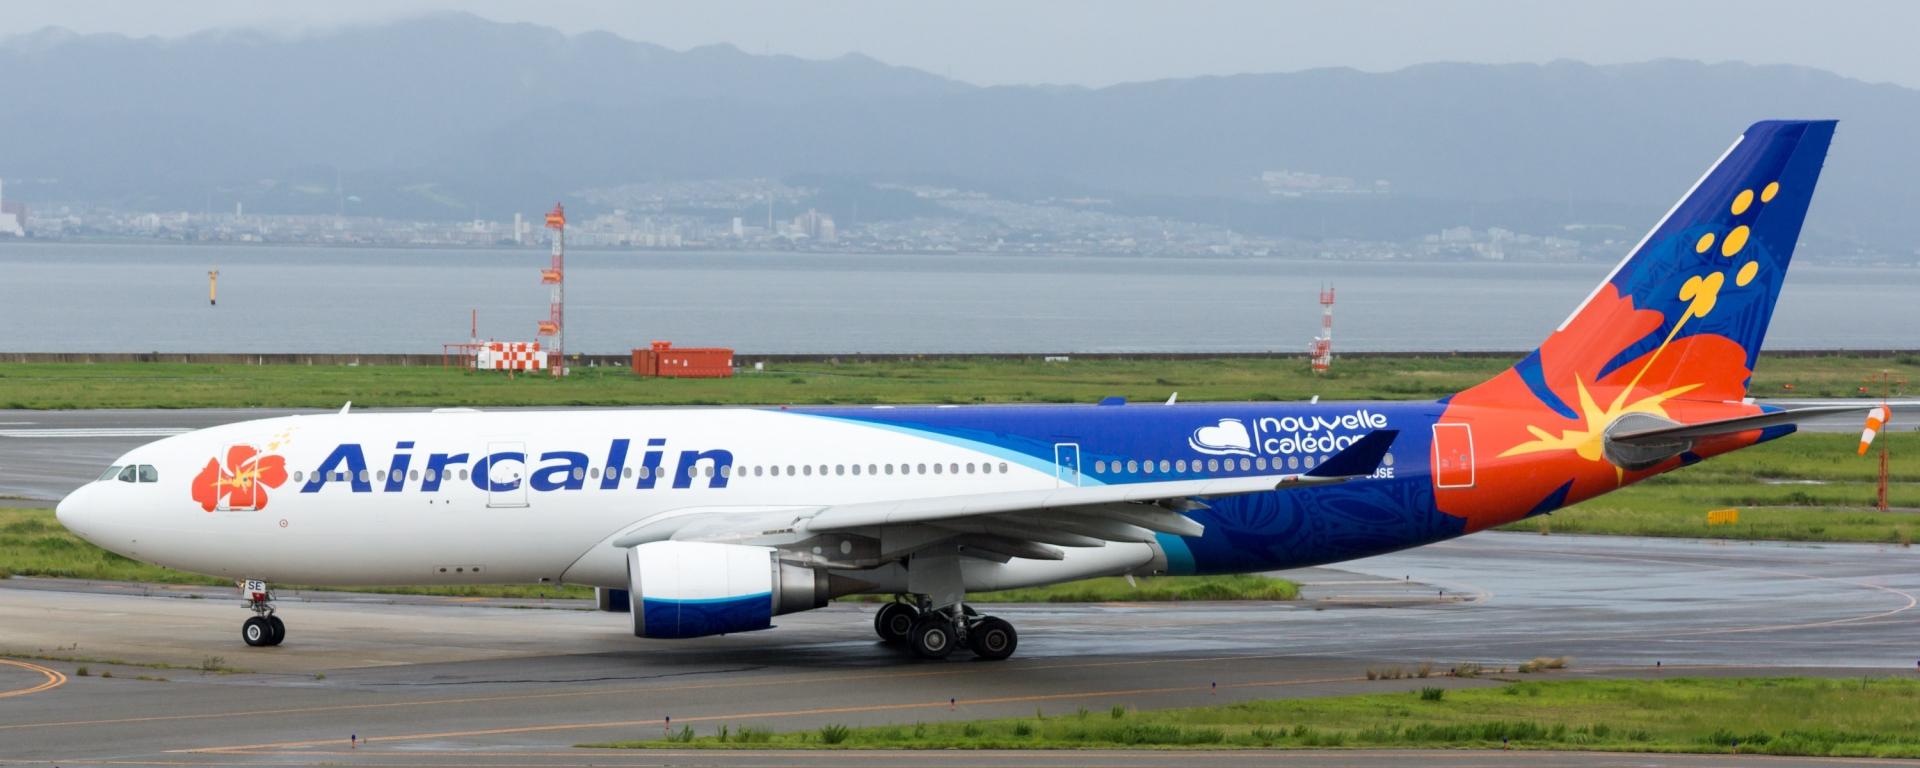 Aircalin a330neo france